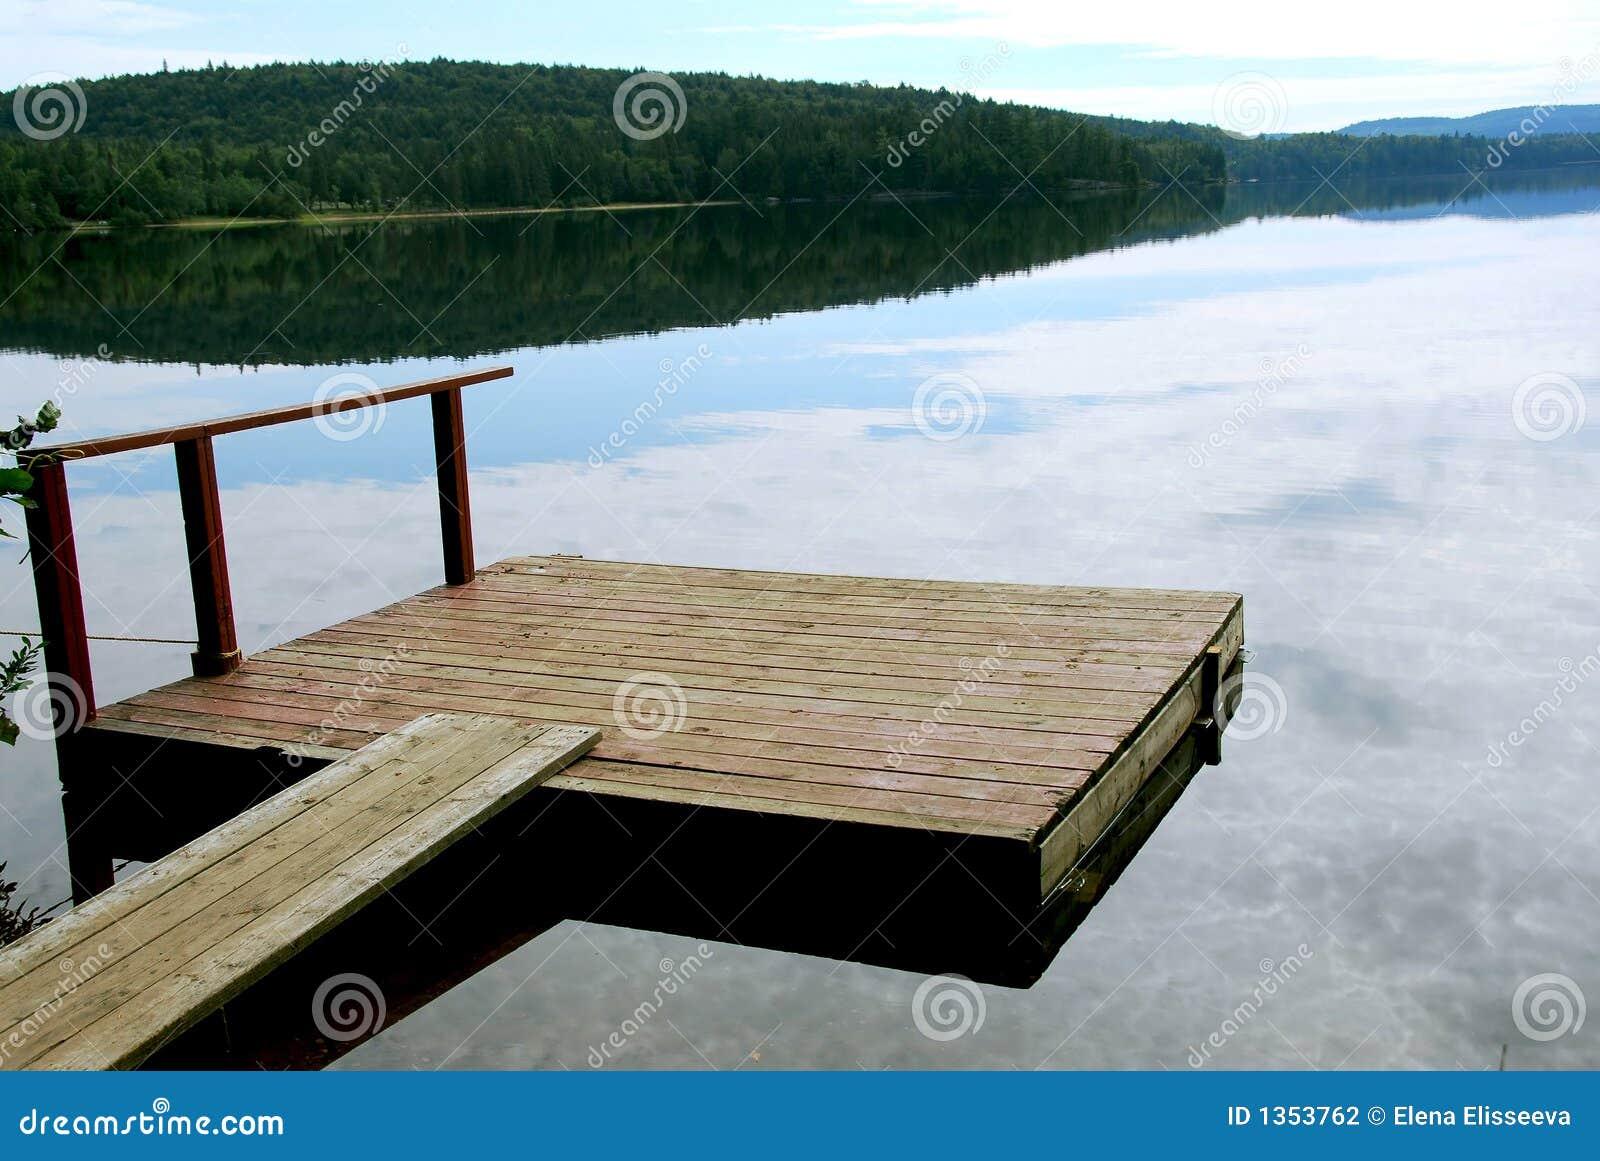 Lake dock stock photo. Image of reflection, calmness, calm ...